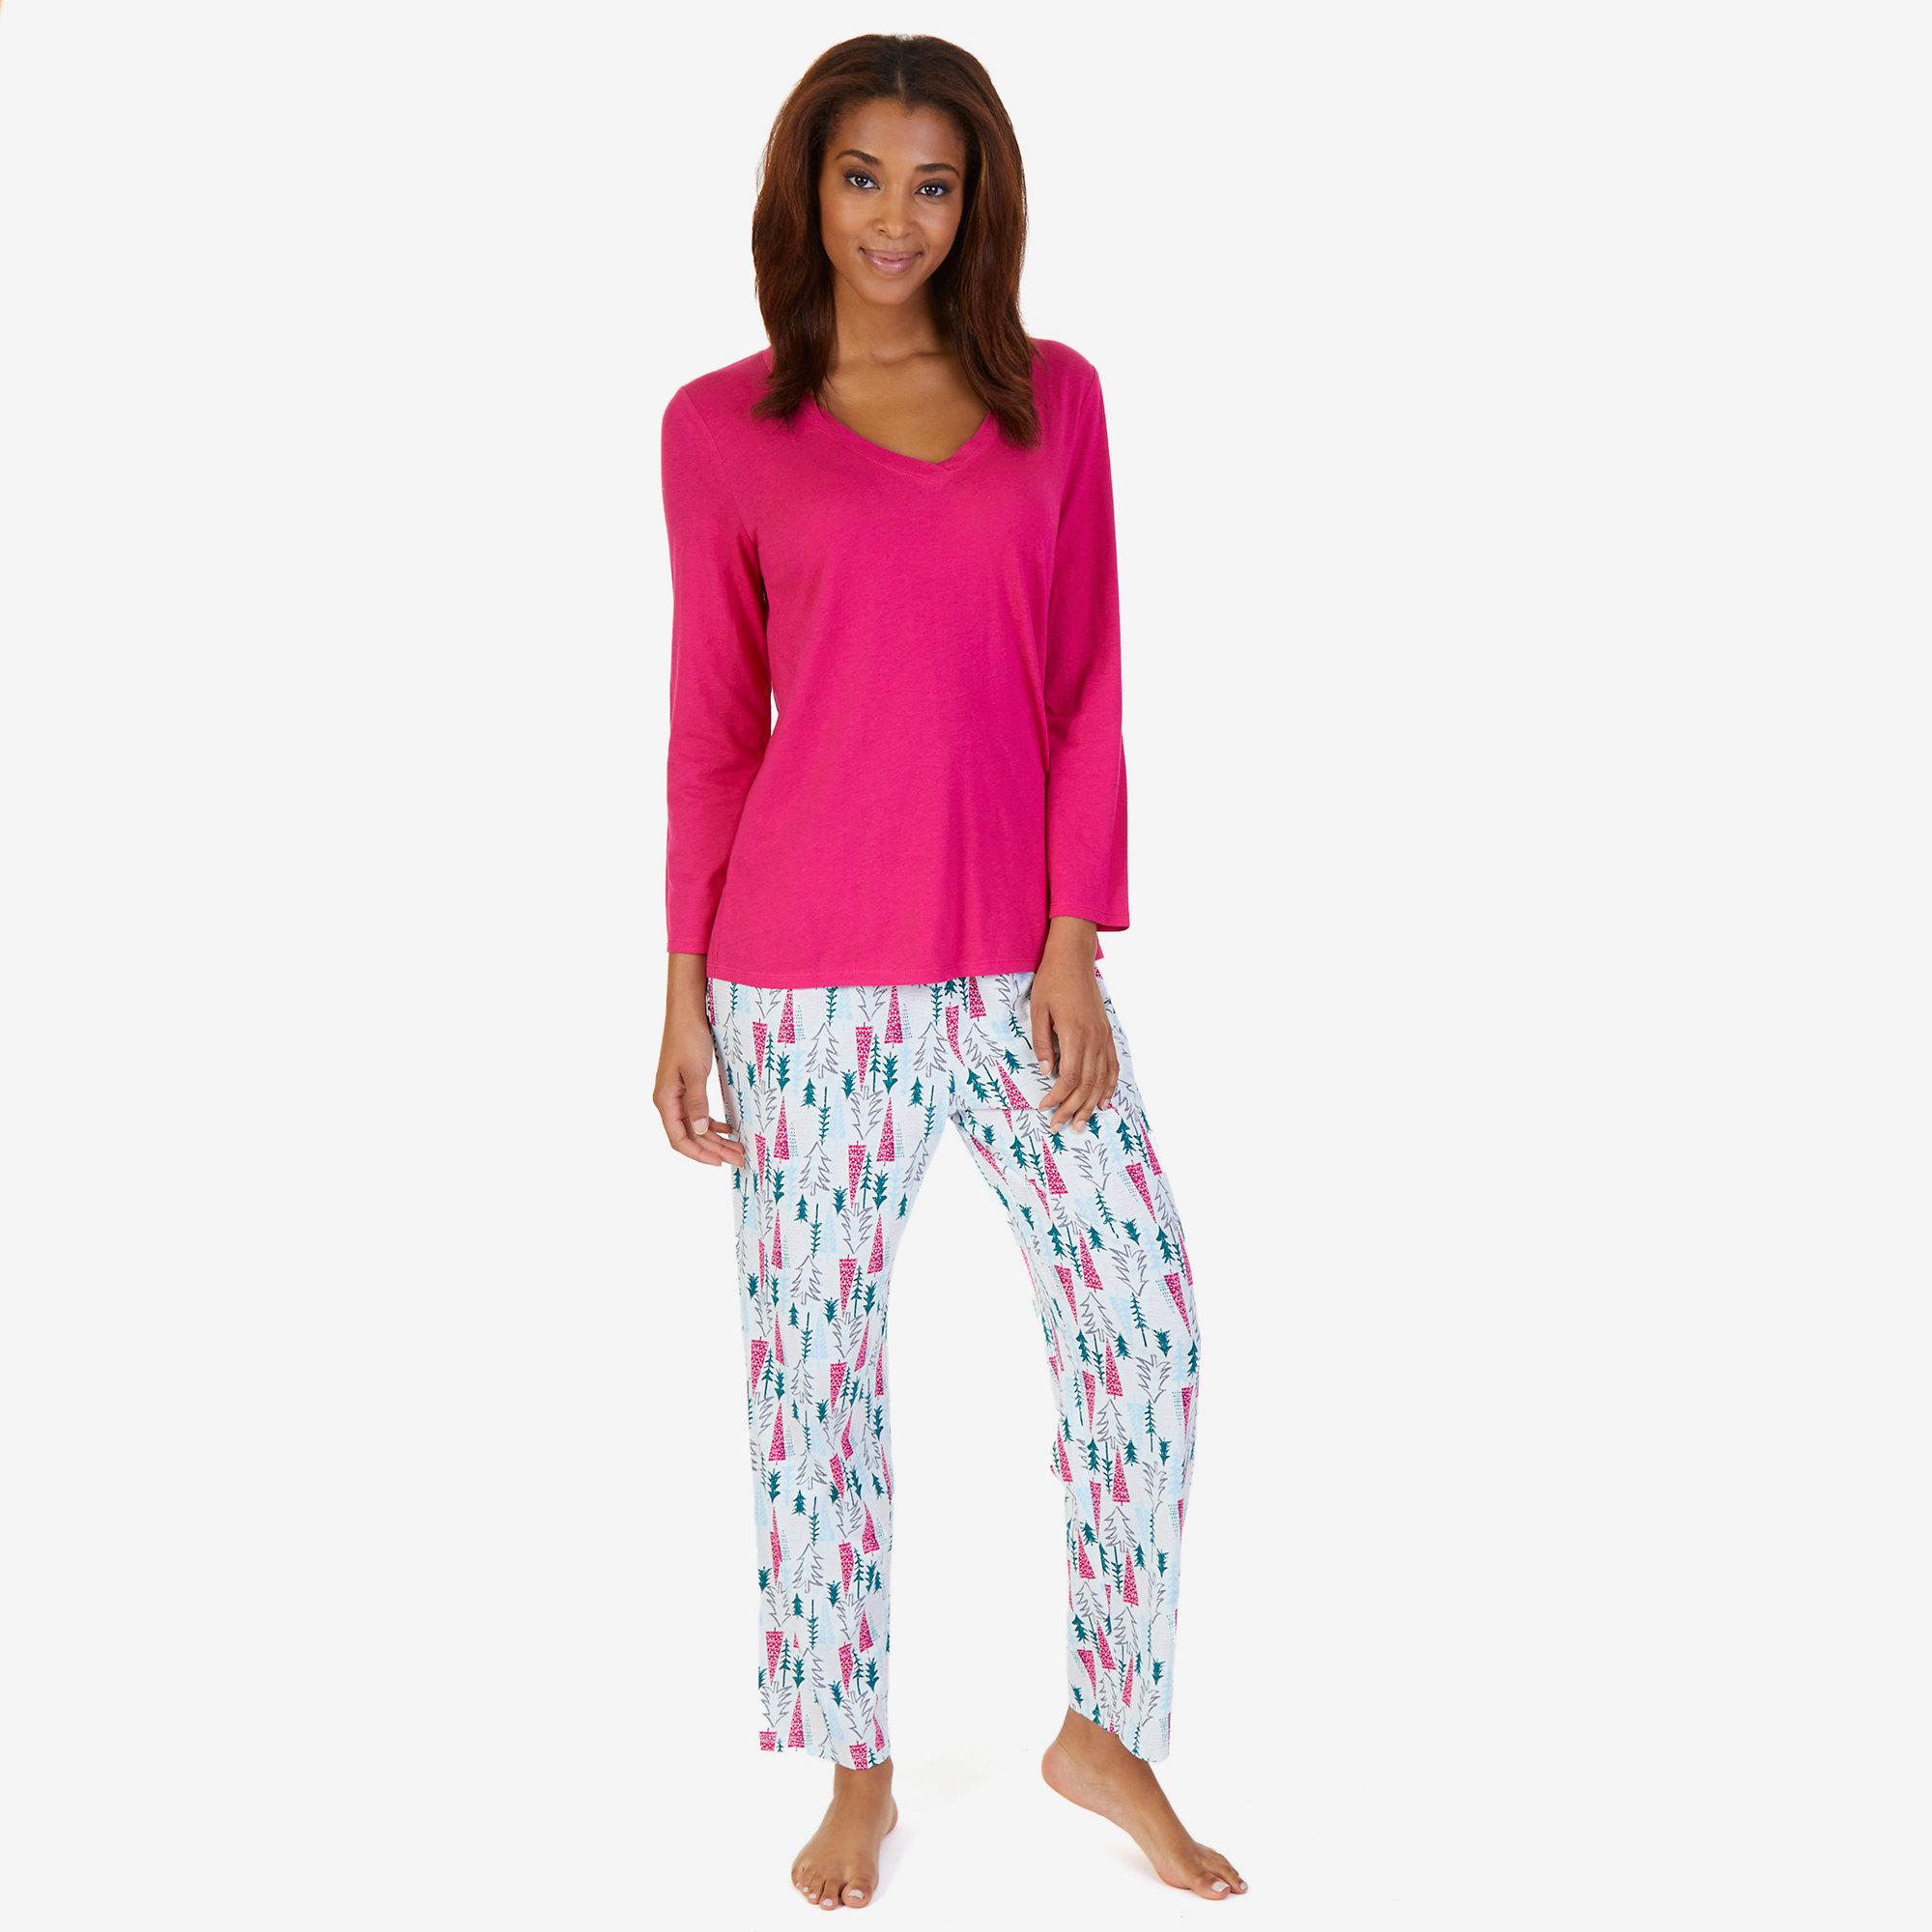 online from pyjamas pin shop floral comfortable grey women next the uk comforter buy most s pajamas